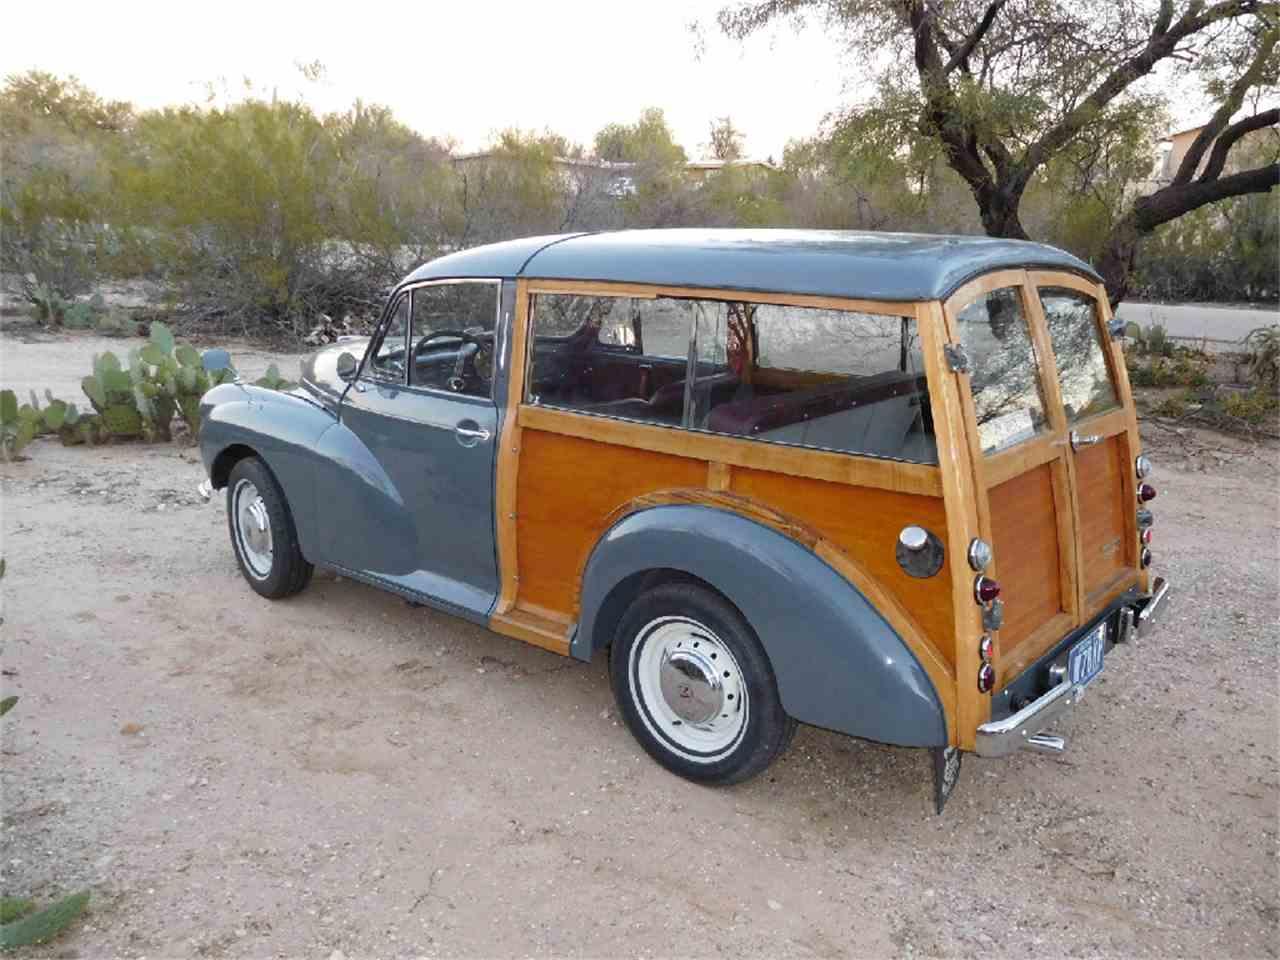 Morris minor traveller for sale - 1959 Morris Minor 1000 2dr Traveler For Sale Cc 967307